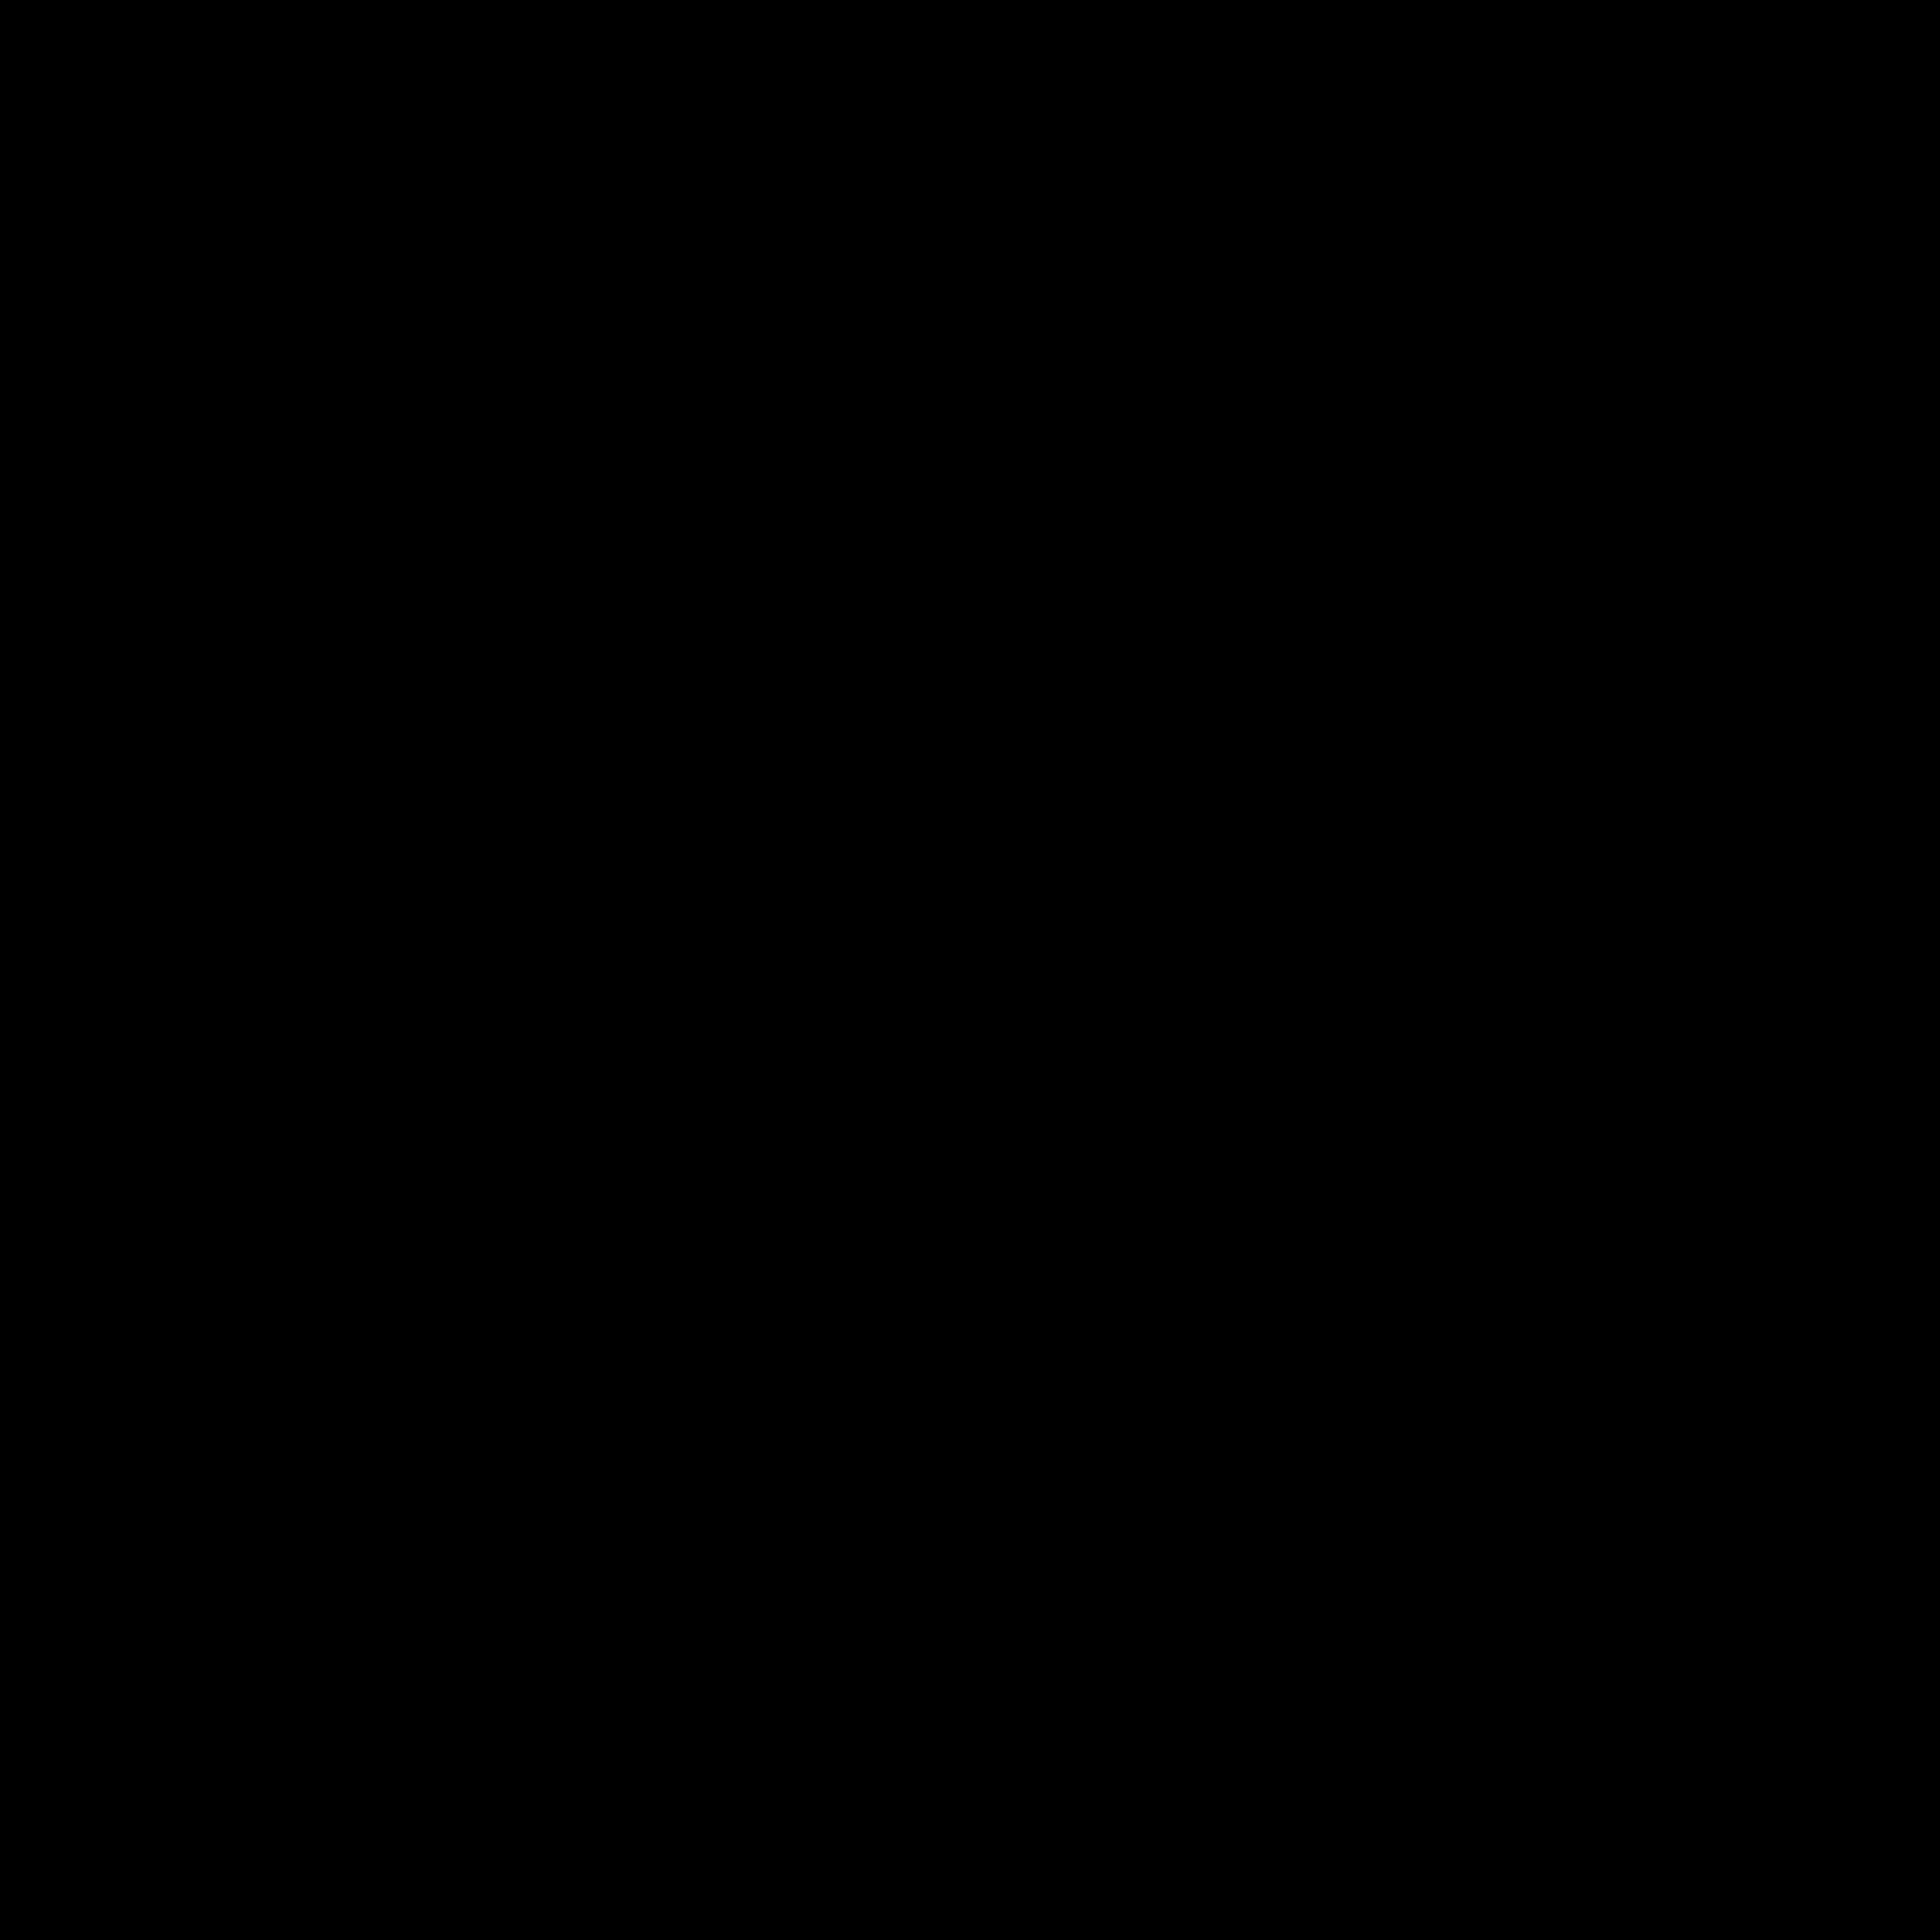 planned-parenthood-logo-png-transparent.png